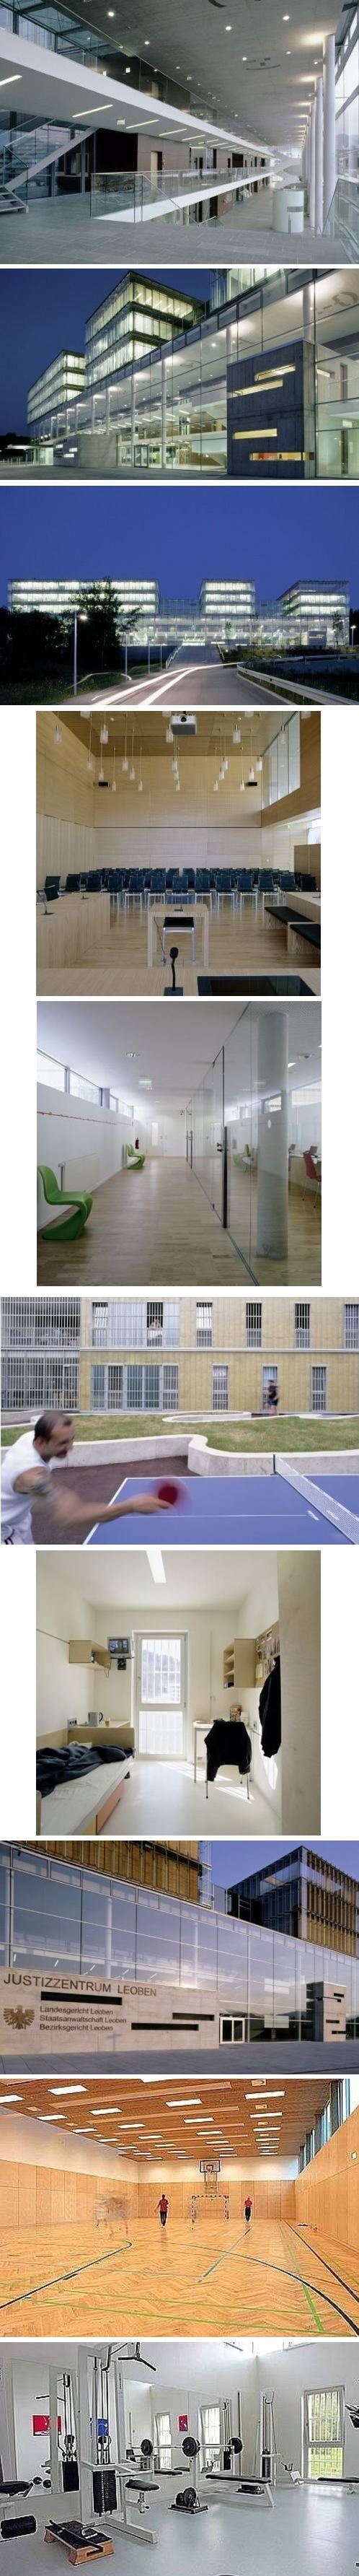 Modern Prison In Leoben, Austria